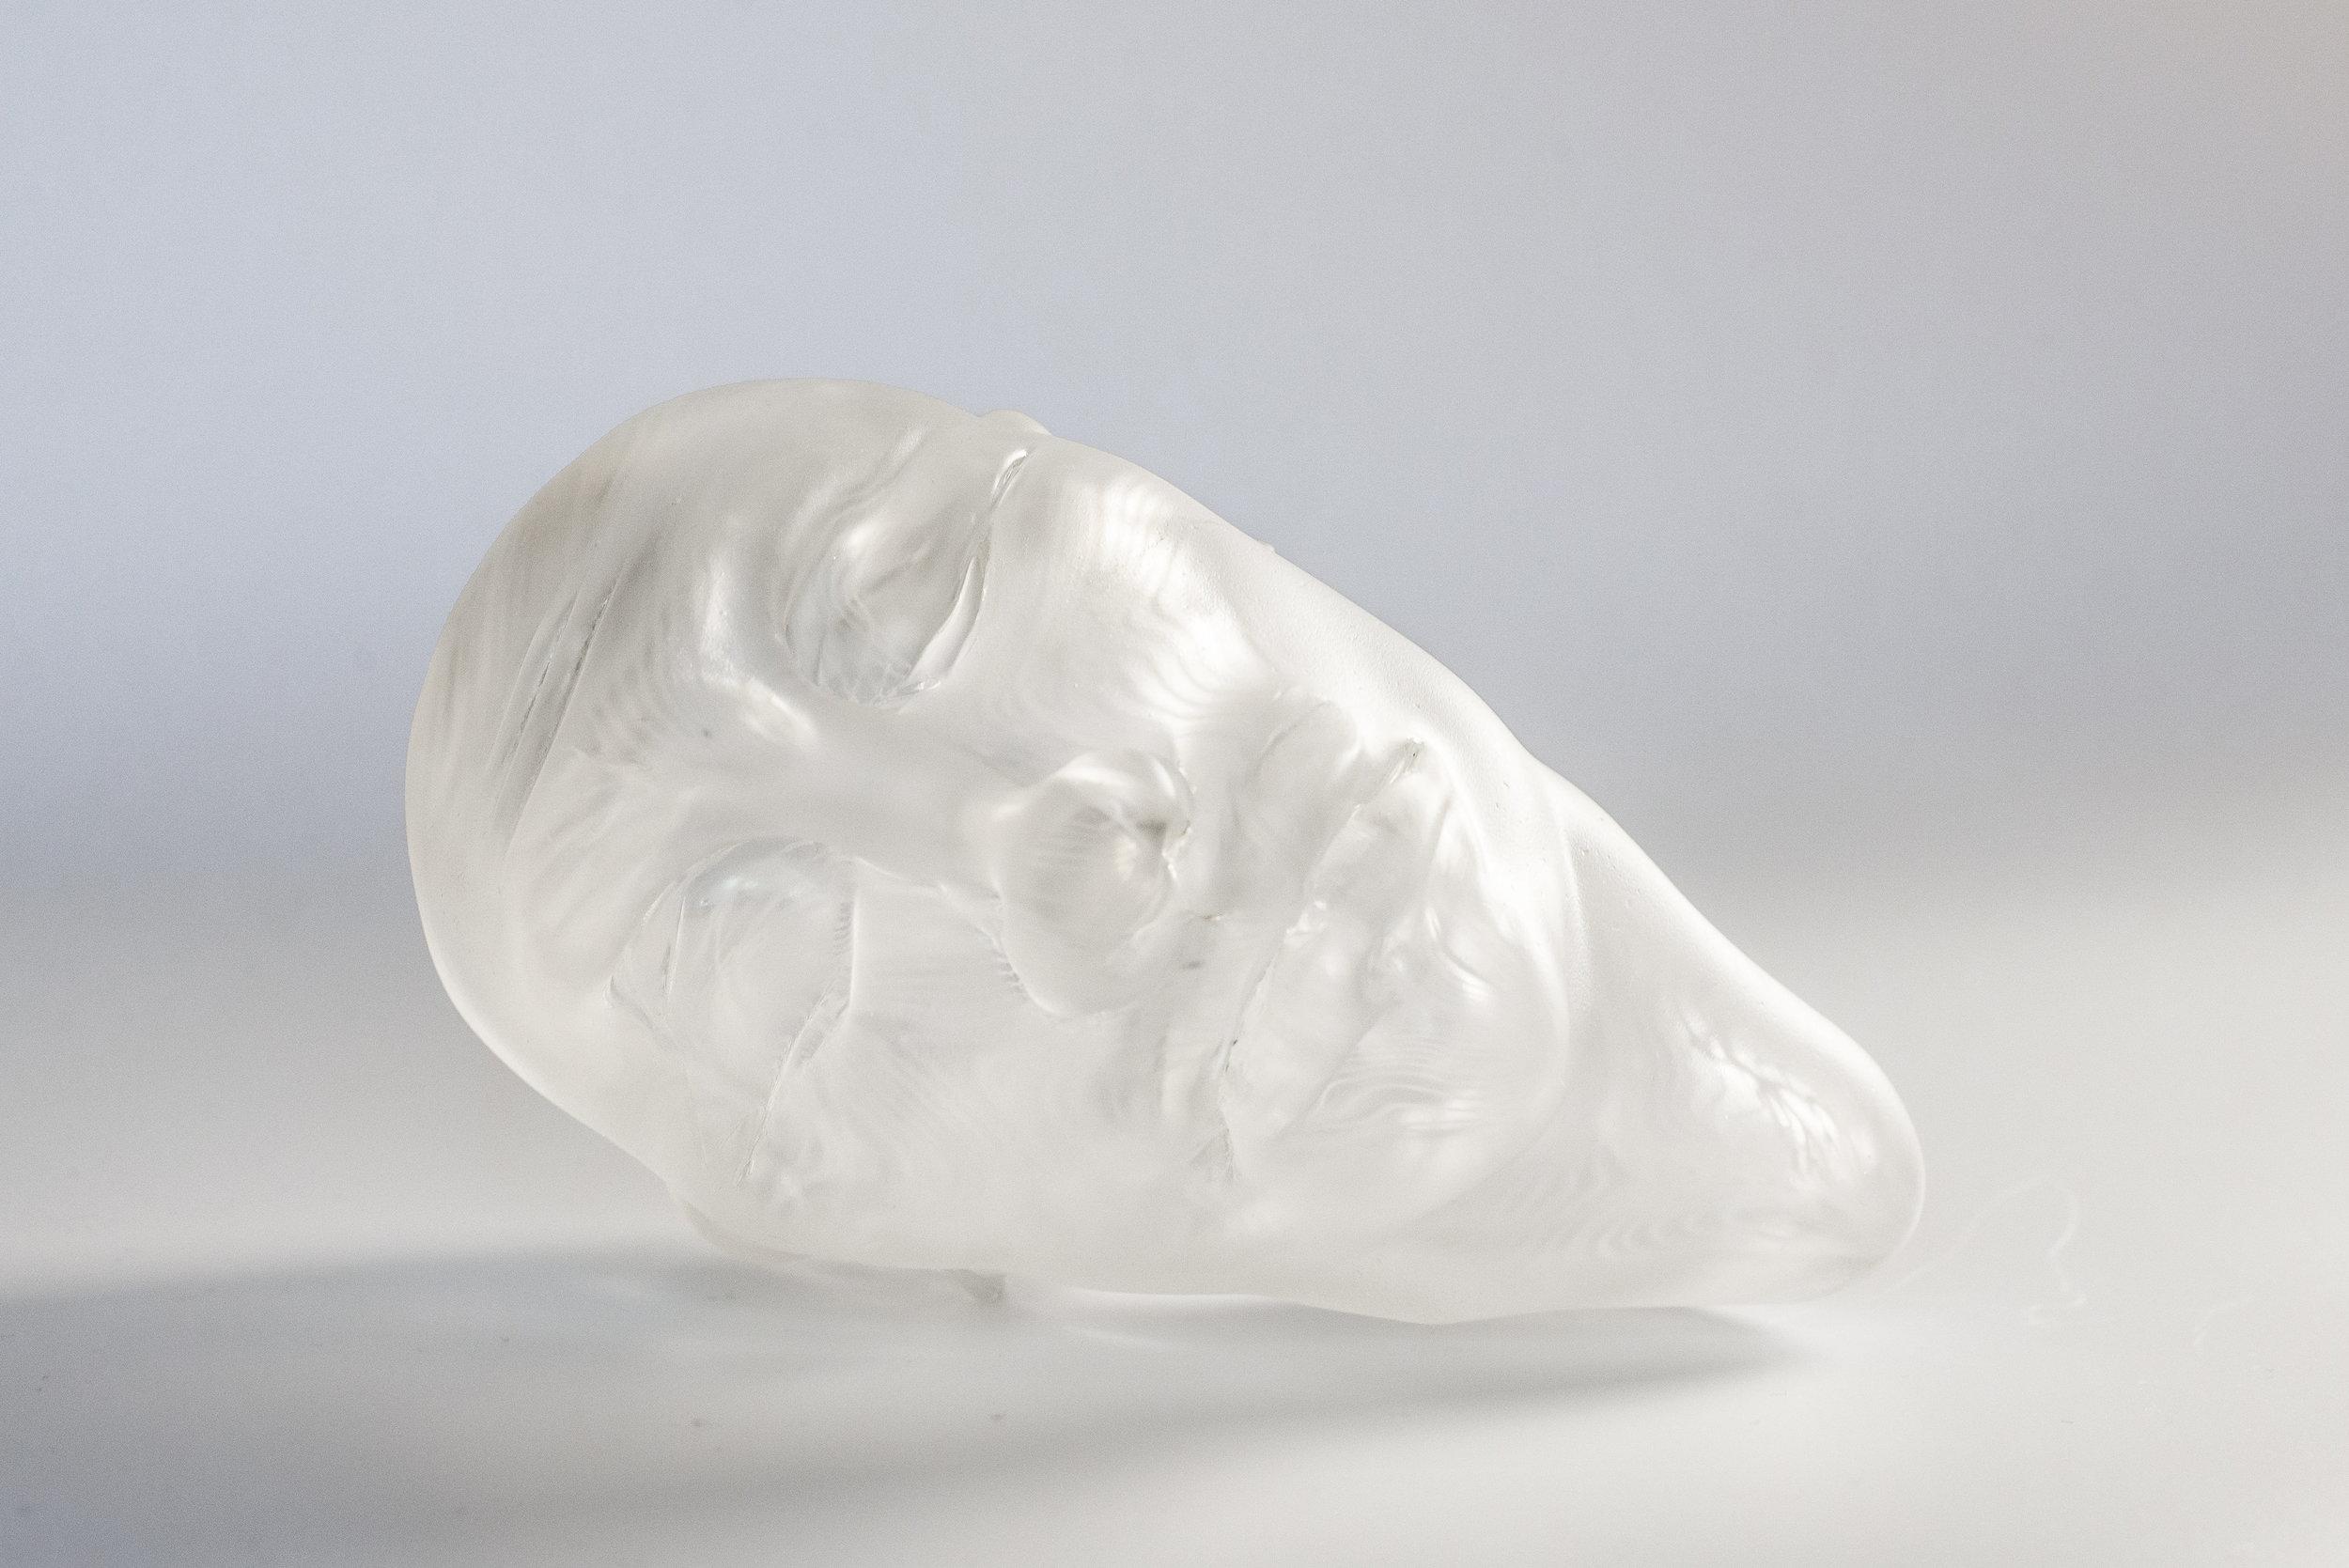 Topo.  Hot sculpting, blown glass. February 2018. 6.5inx4.25in.